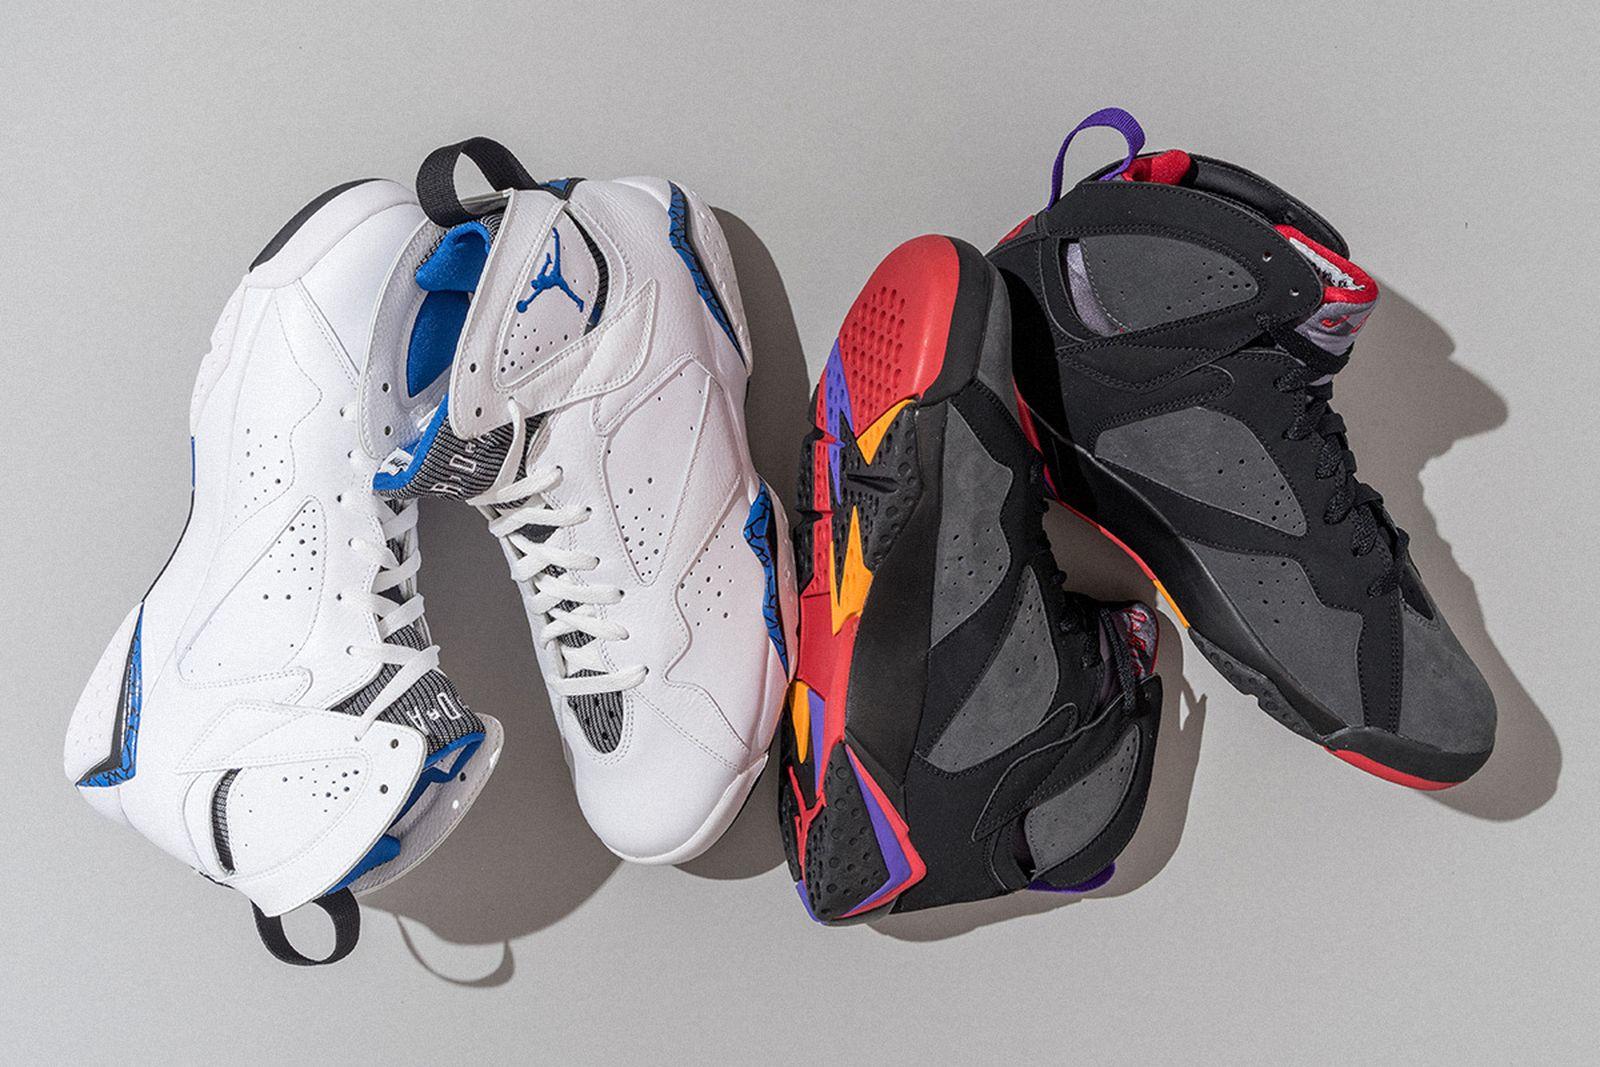 brad-hogan-jordan-sneaker-collection-01